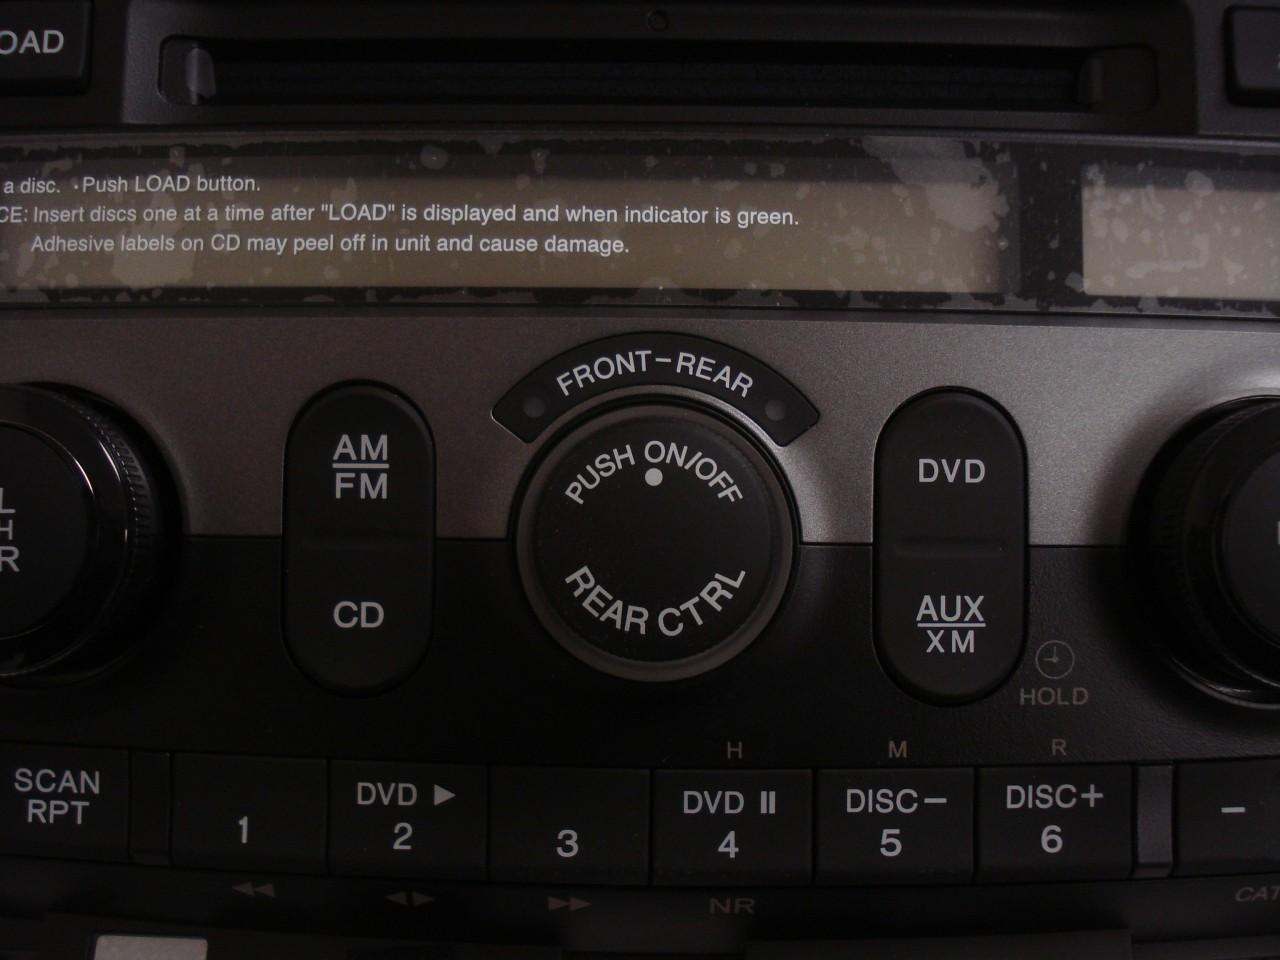 Can I Get Sirius On My Xm Car Radio